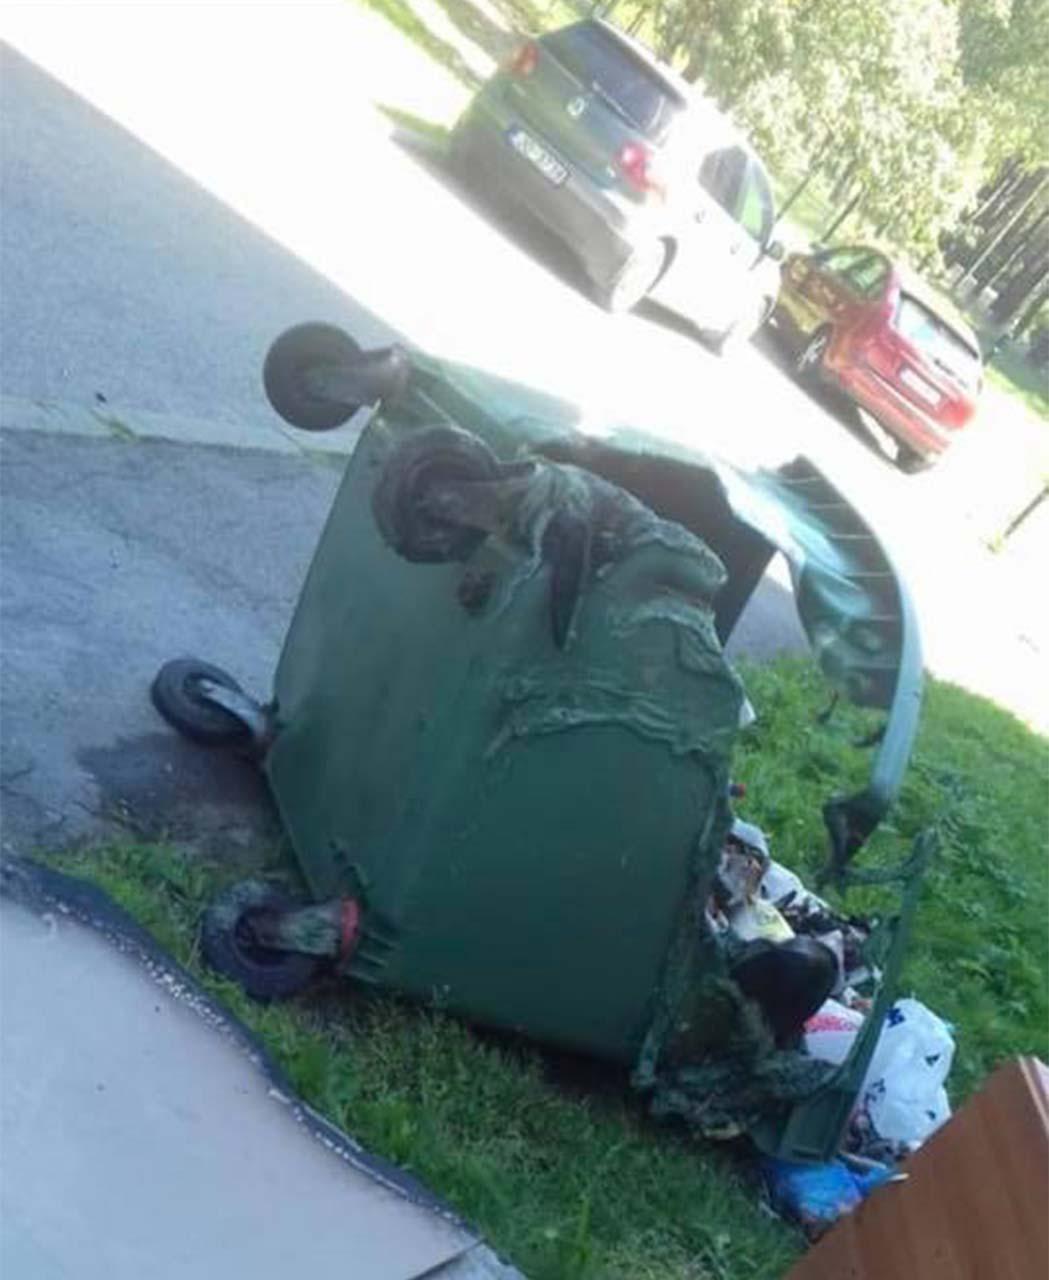 Sadegusi un nogāzta atkritumu tvertne